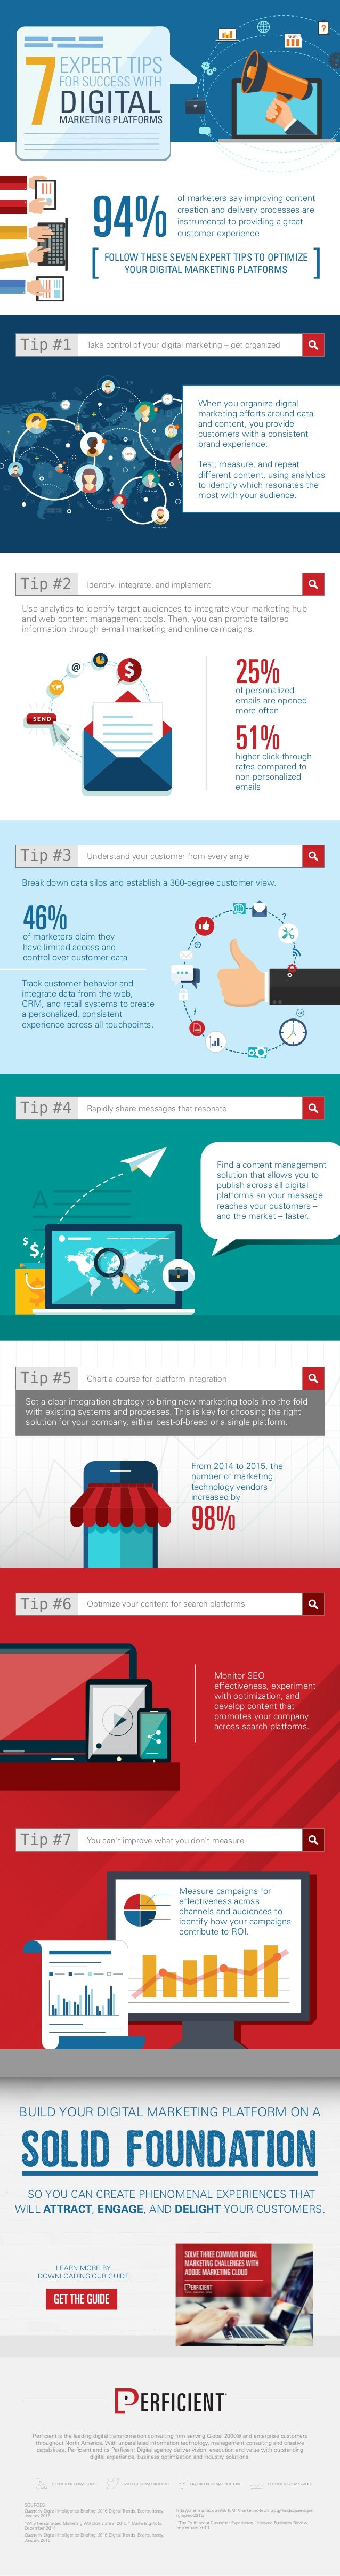 EXPERT TIPS FOR SUCCESS IN DIGITAL MARKETING PERFICIENT.COM/BLOGS TWITTER.COM/PERFICIENT FACEBOOK.COM/PERFICIENT PERFICIEN...